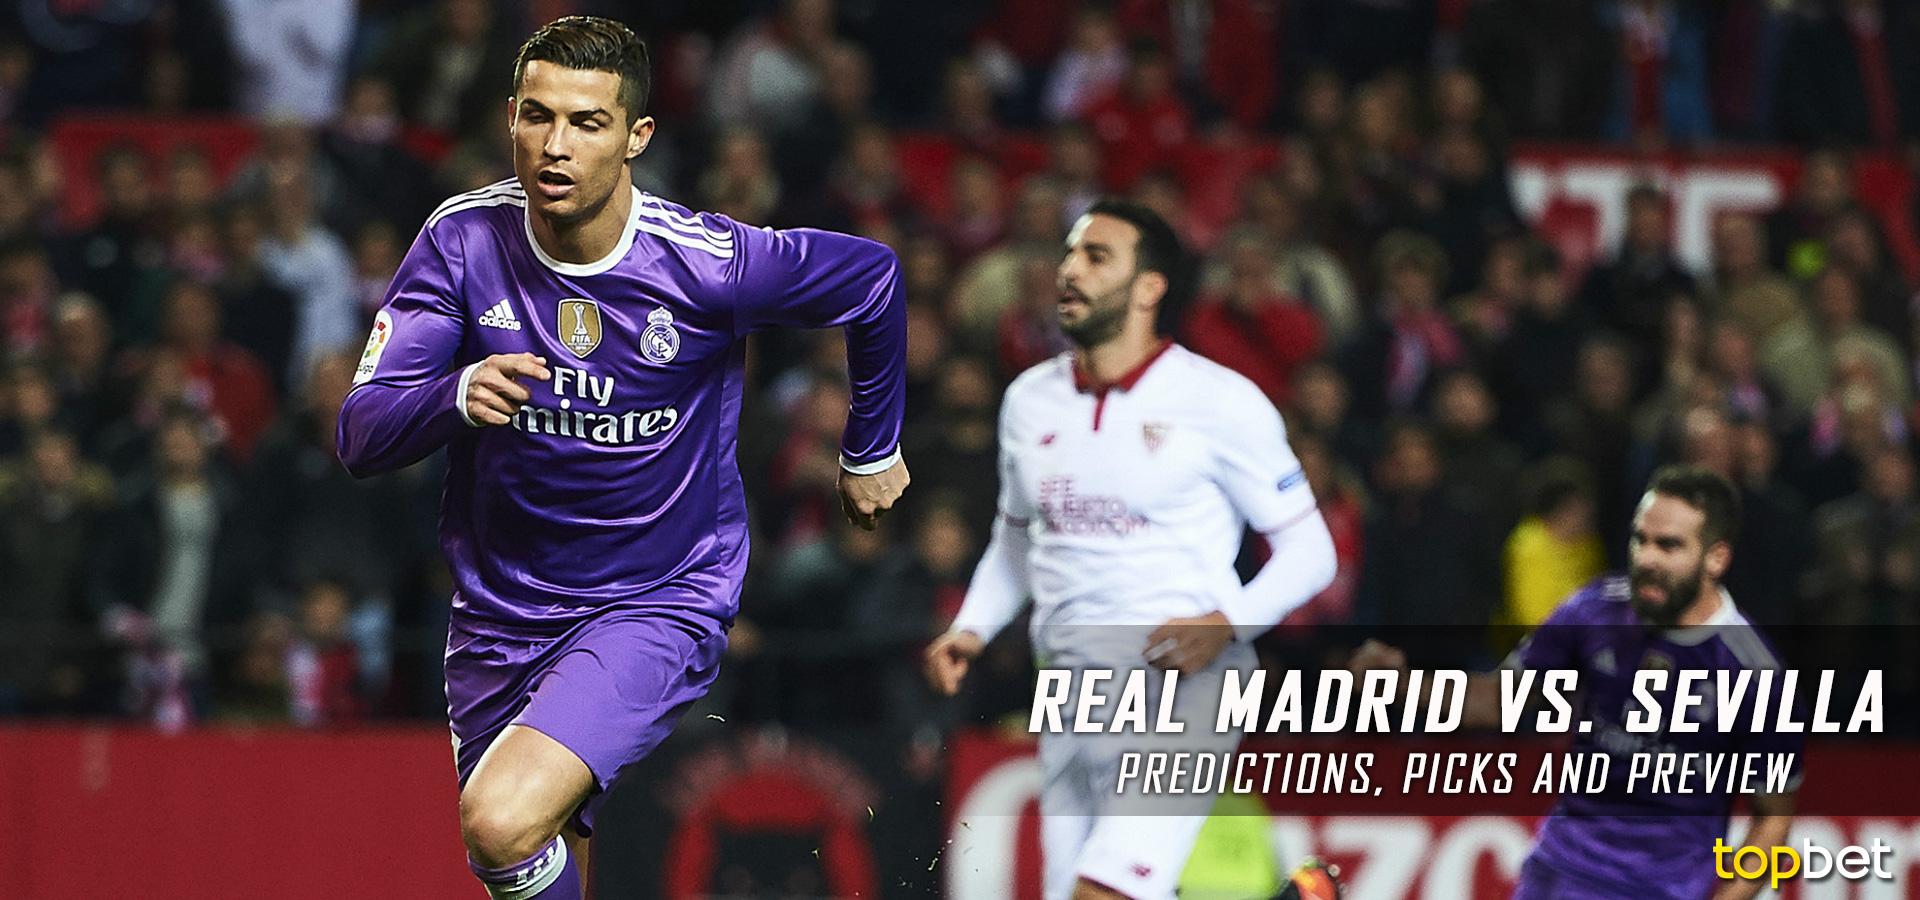 Real Madrid vs Sevilla Predictions, Picks, Odds and Preview